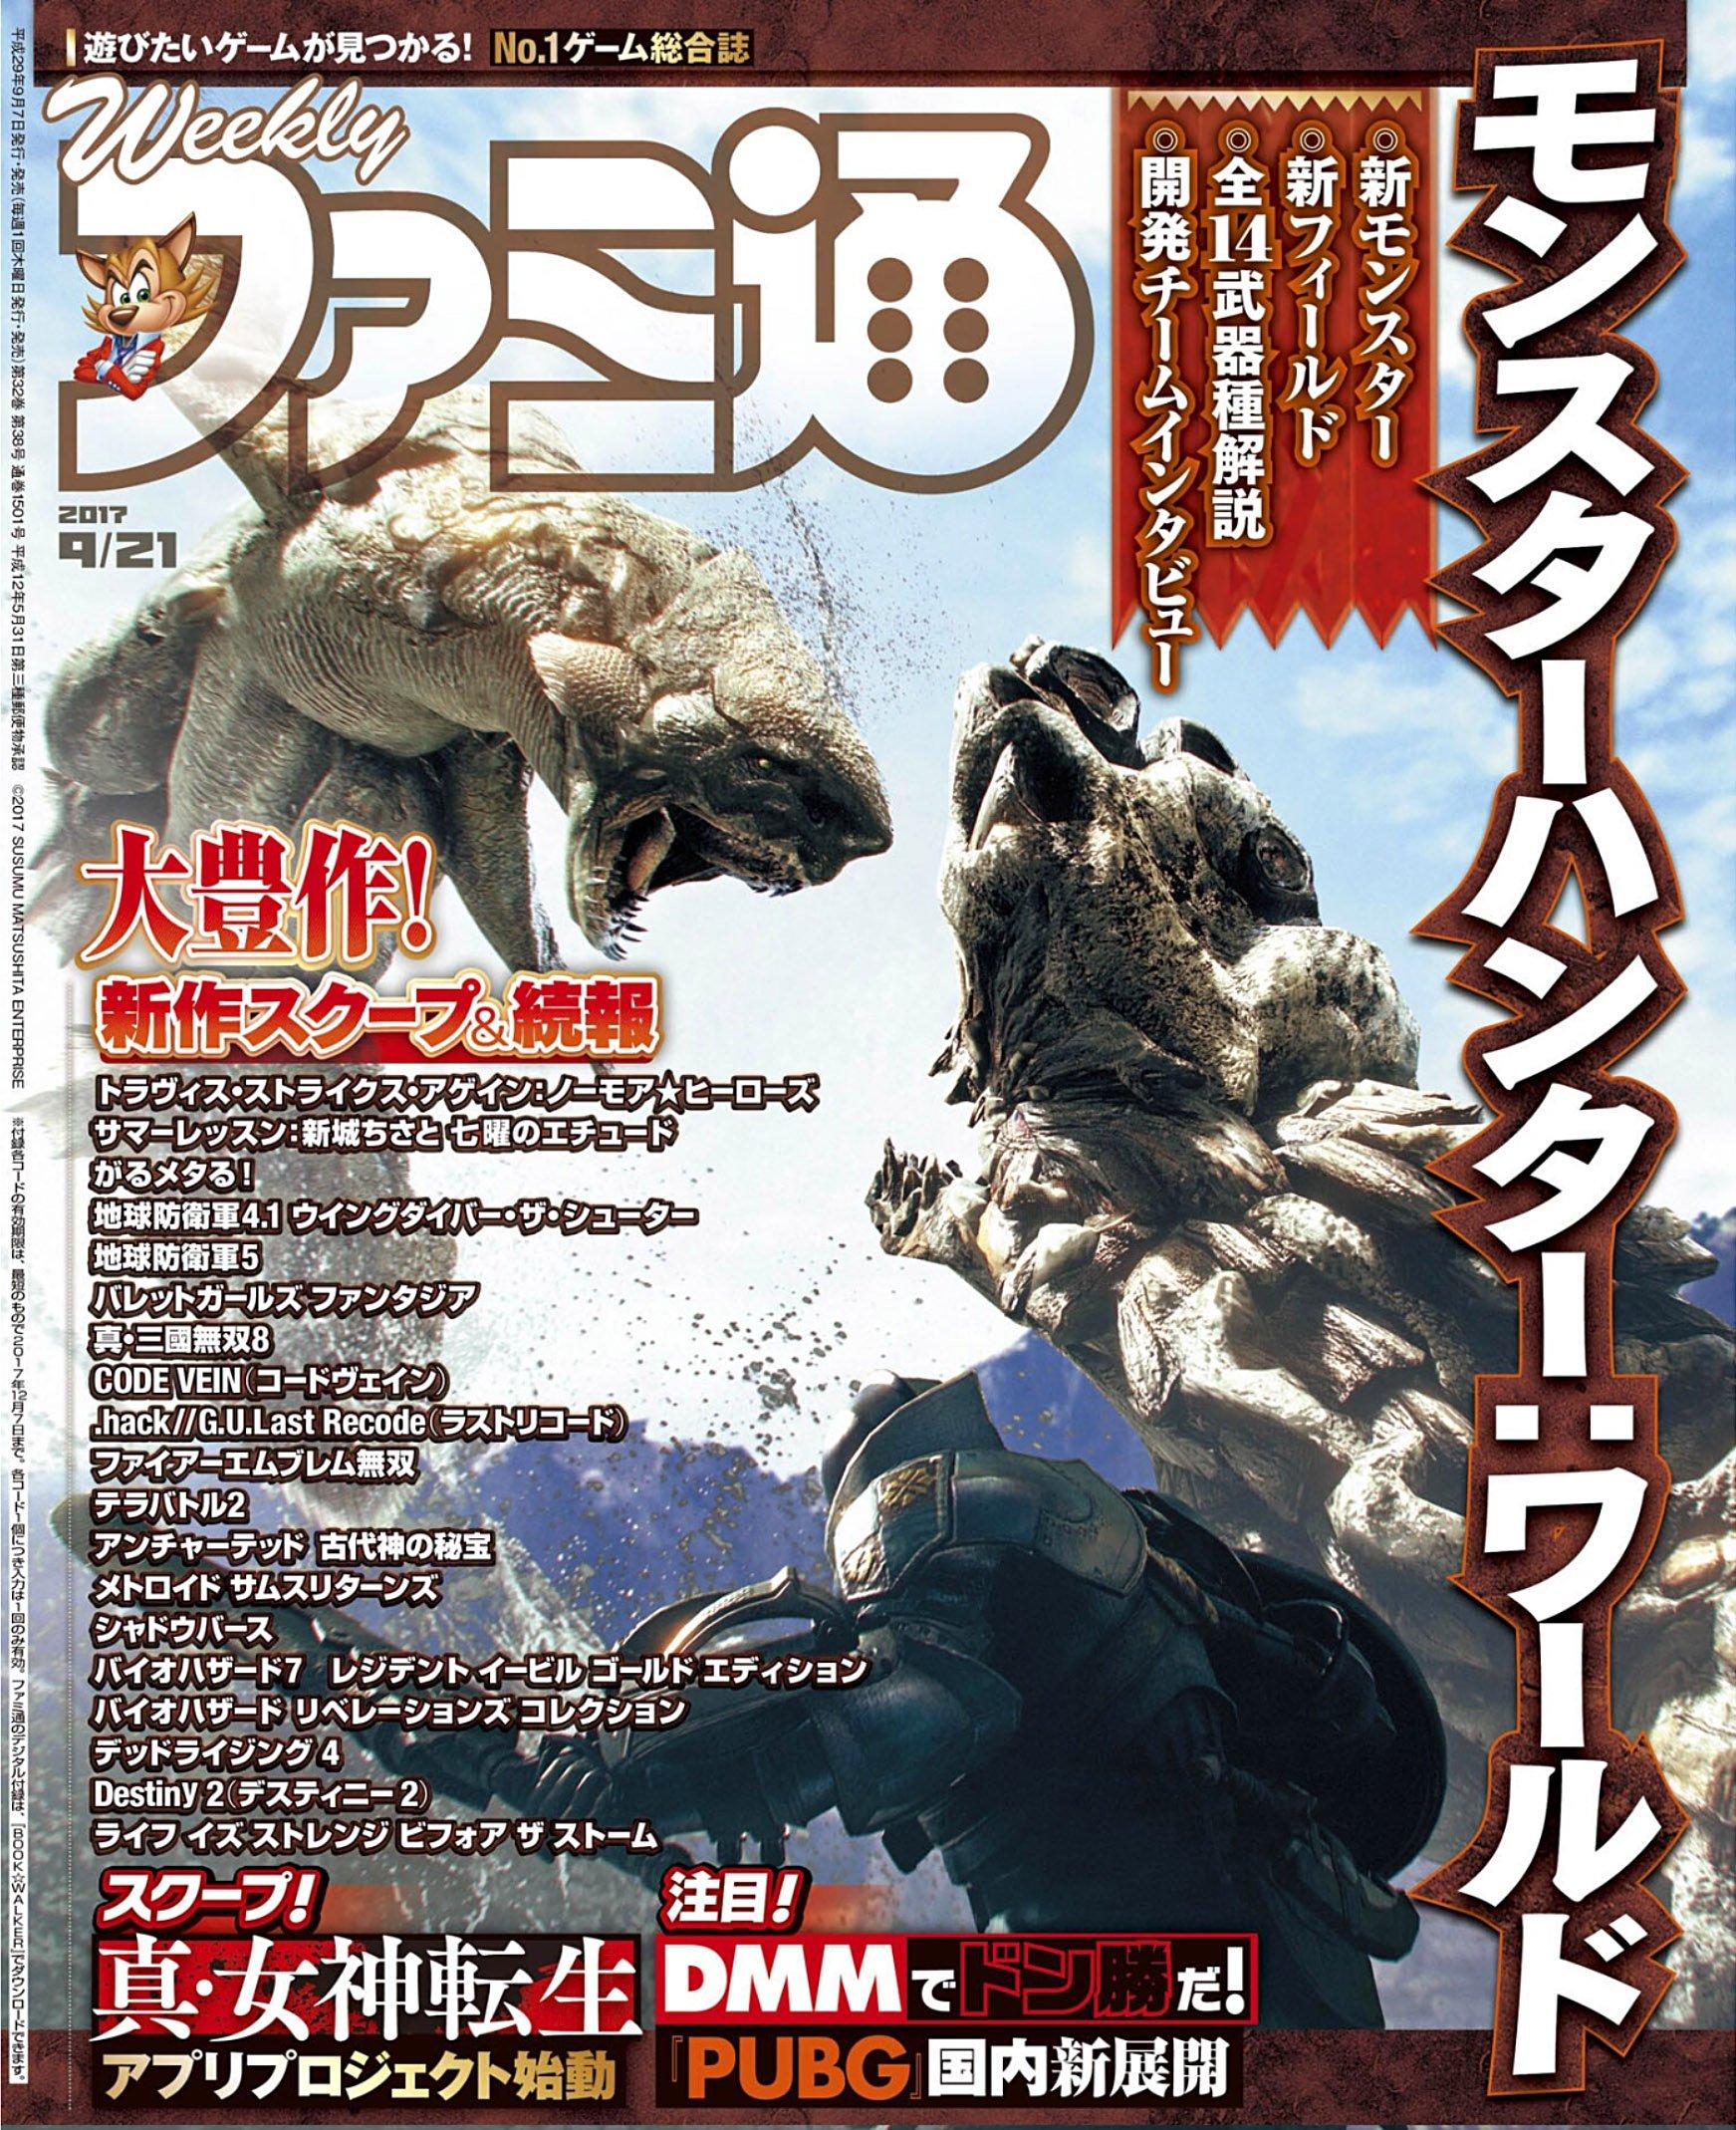 Famitsu 1501 September 21, 2017